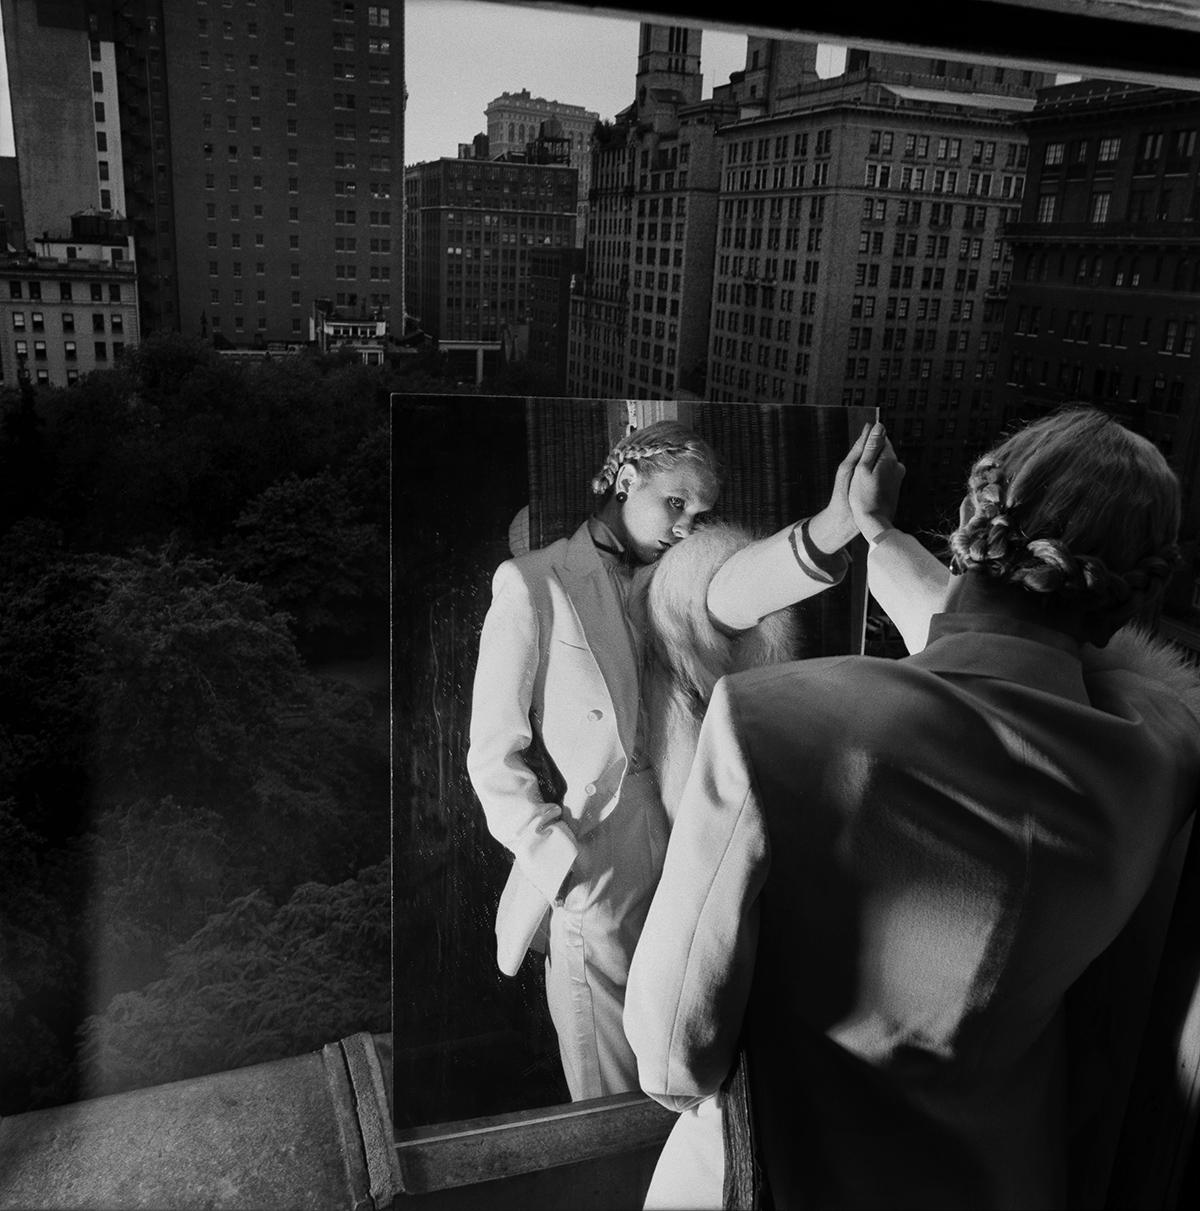 Gramercy Park Balcony 1978 © Jean Pagliuso; Courtesy of the artist and Mary Ryan Gallery, New York.